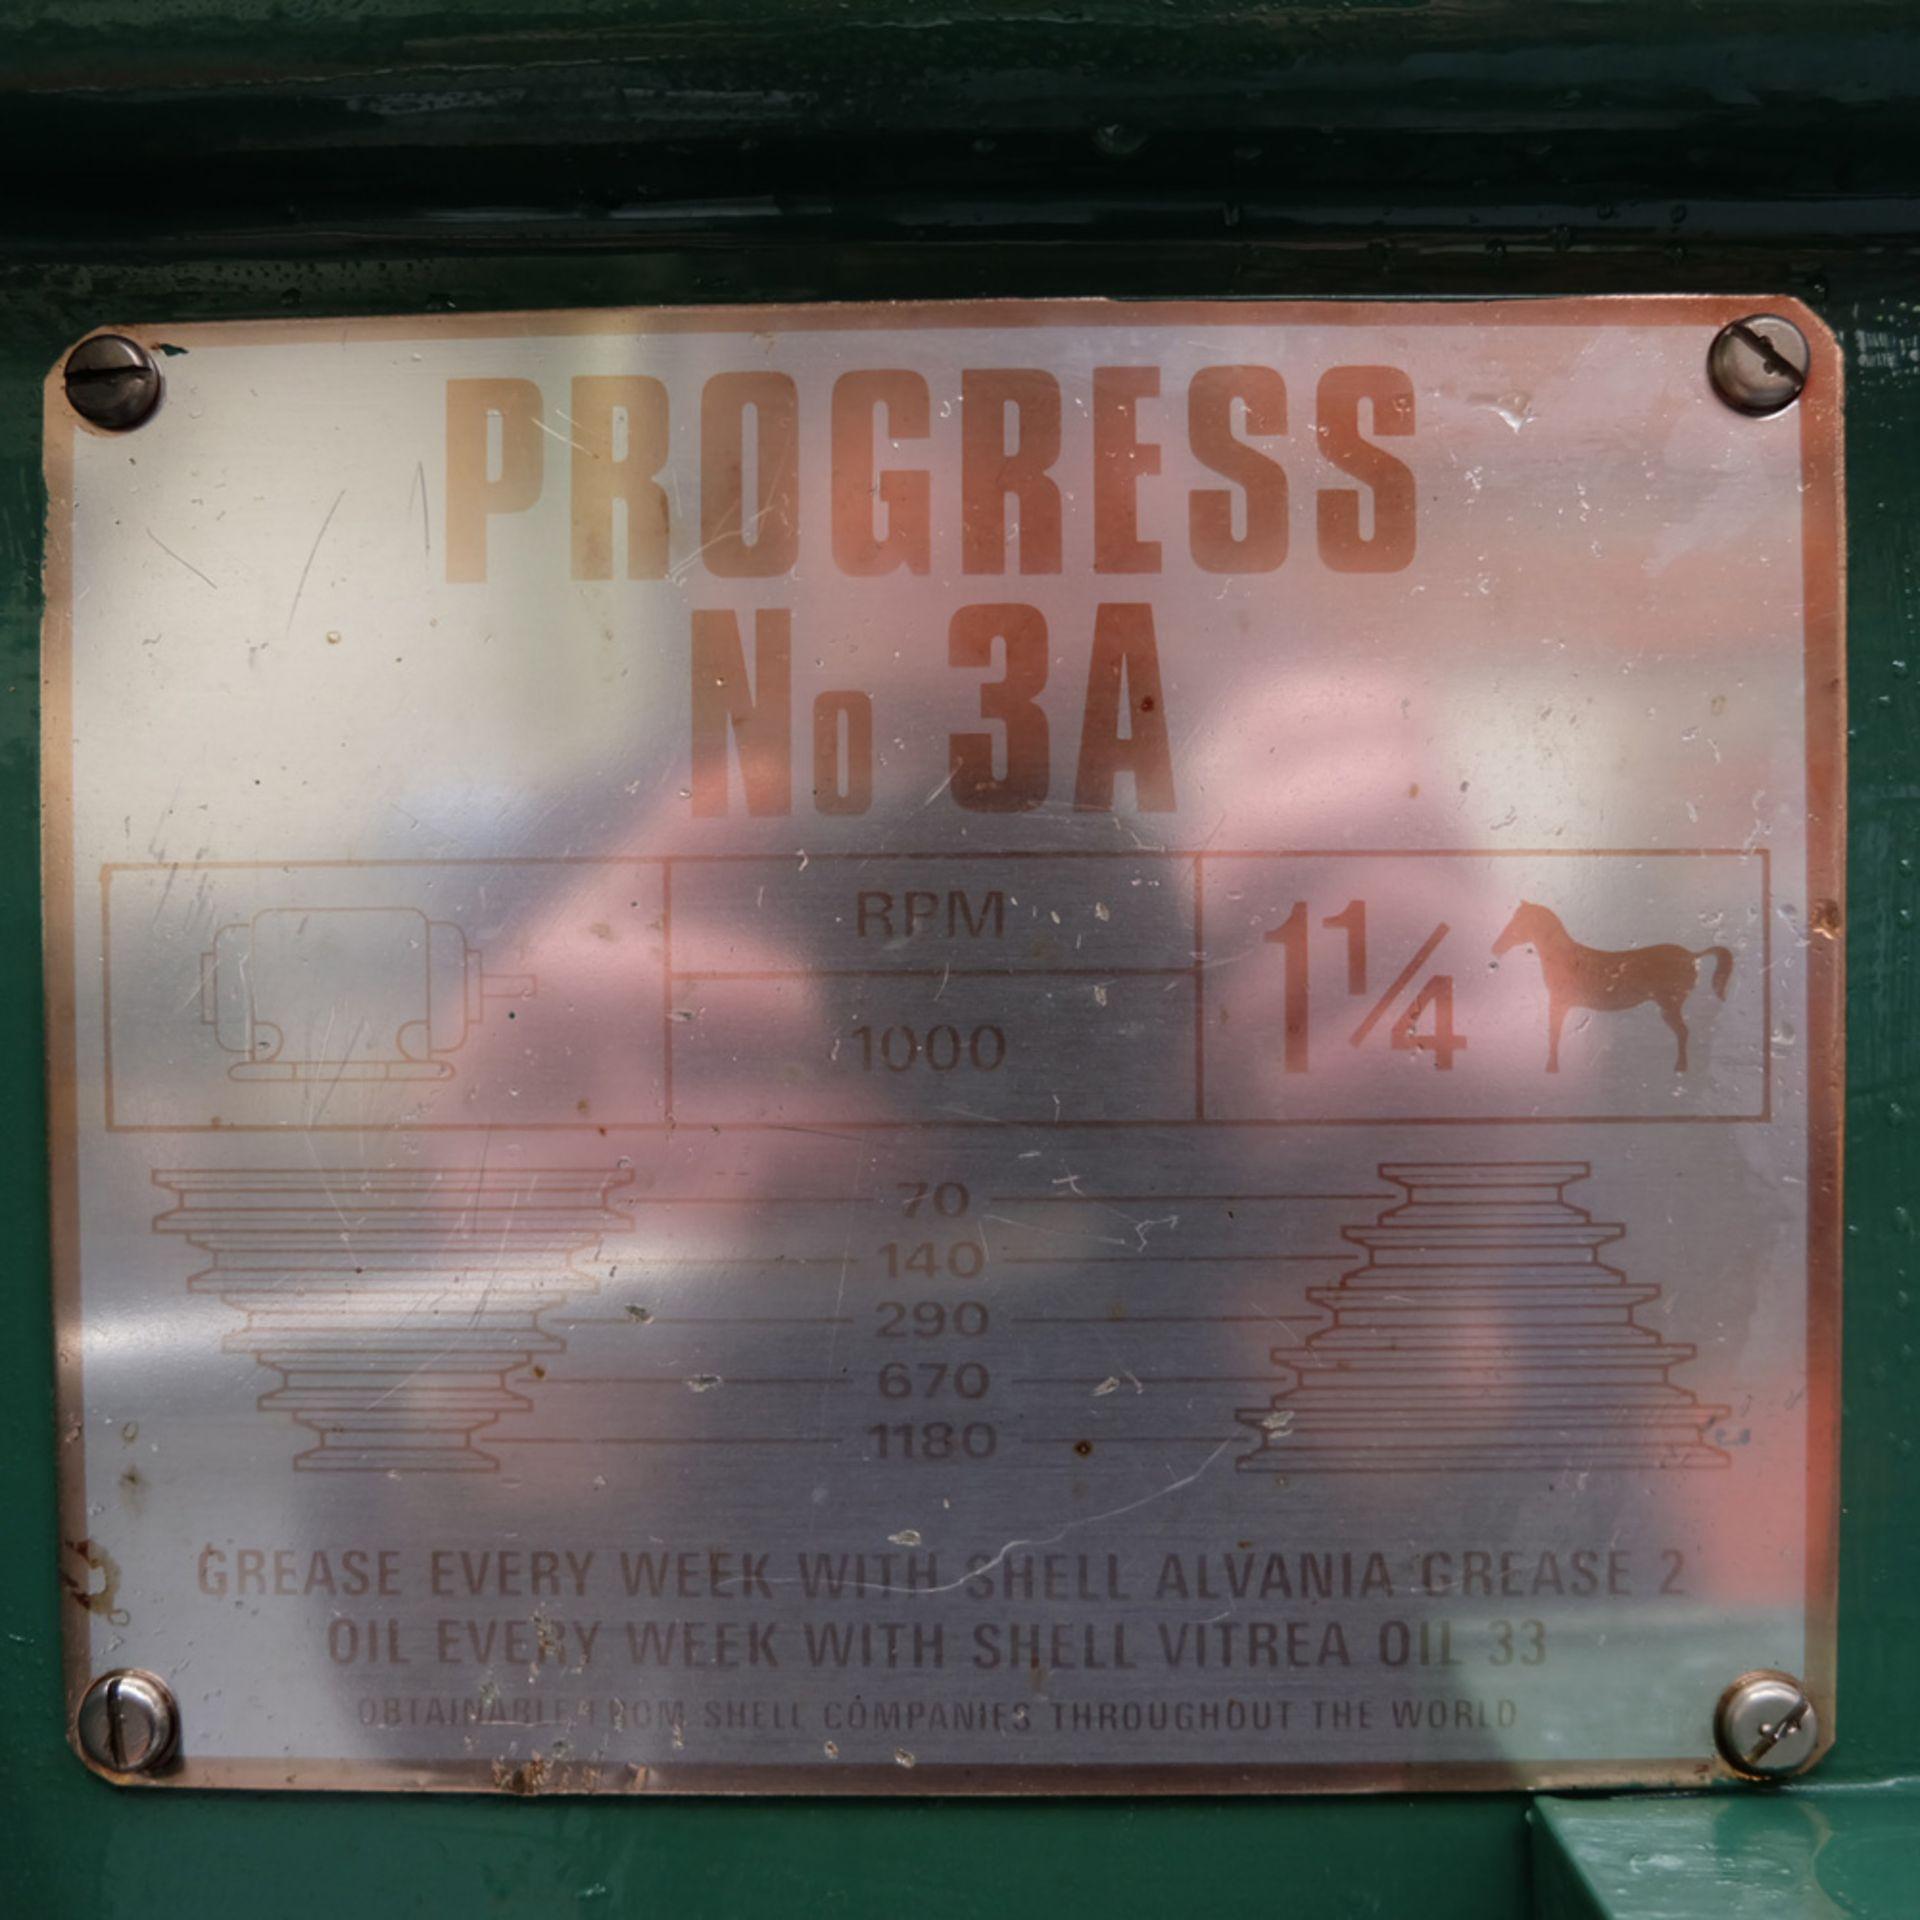 Elliott Progress 3A Heavy Duty Pillar Drill. Spindle Taper No.3 Morse. - Image 5 of 9